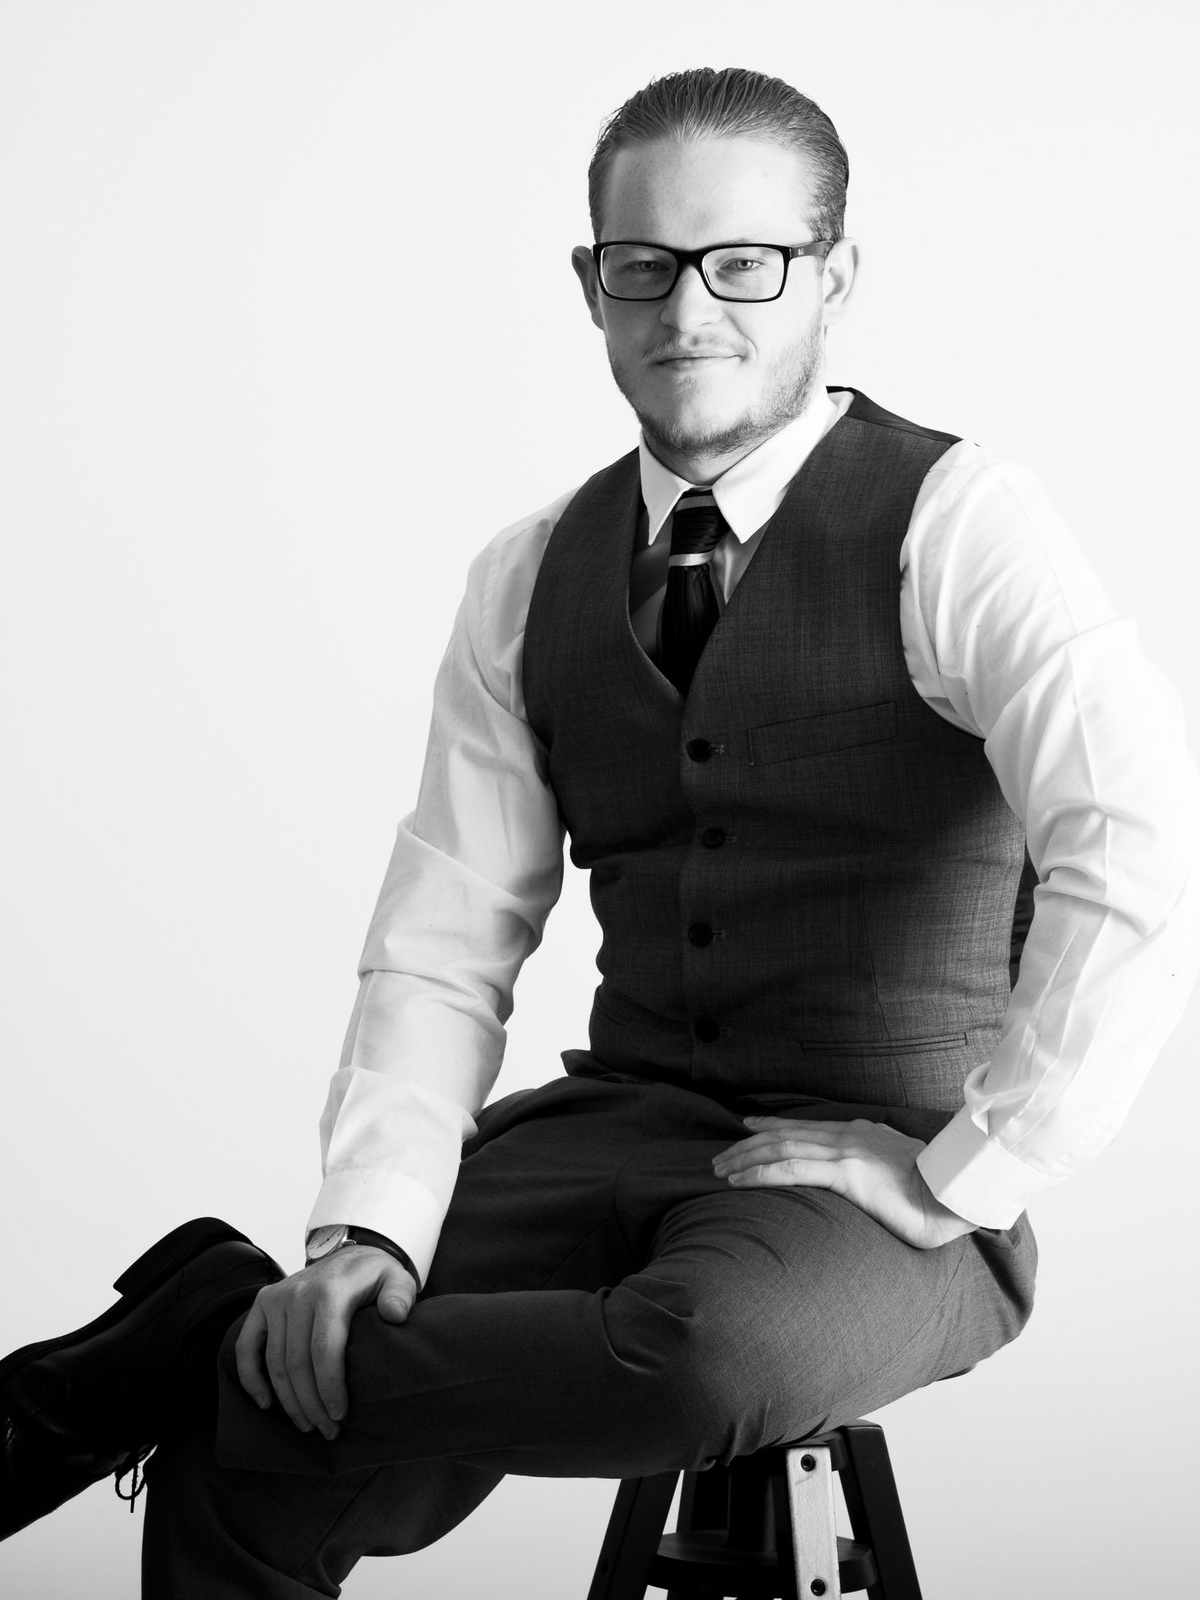 PATRICK MITCHELL  Junior Software Engineer